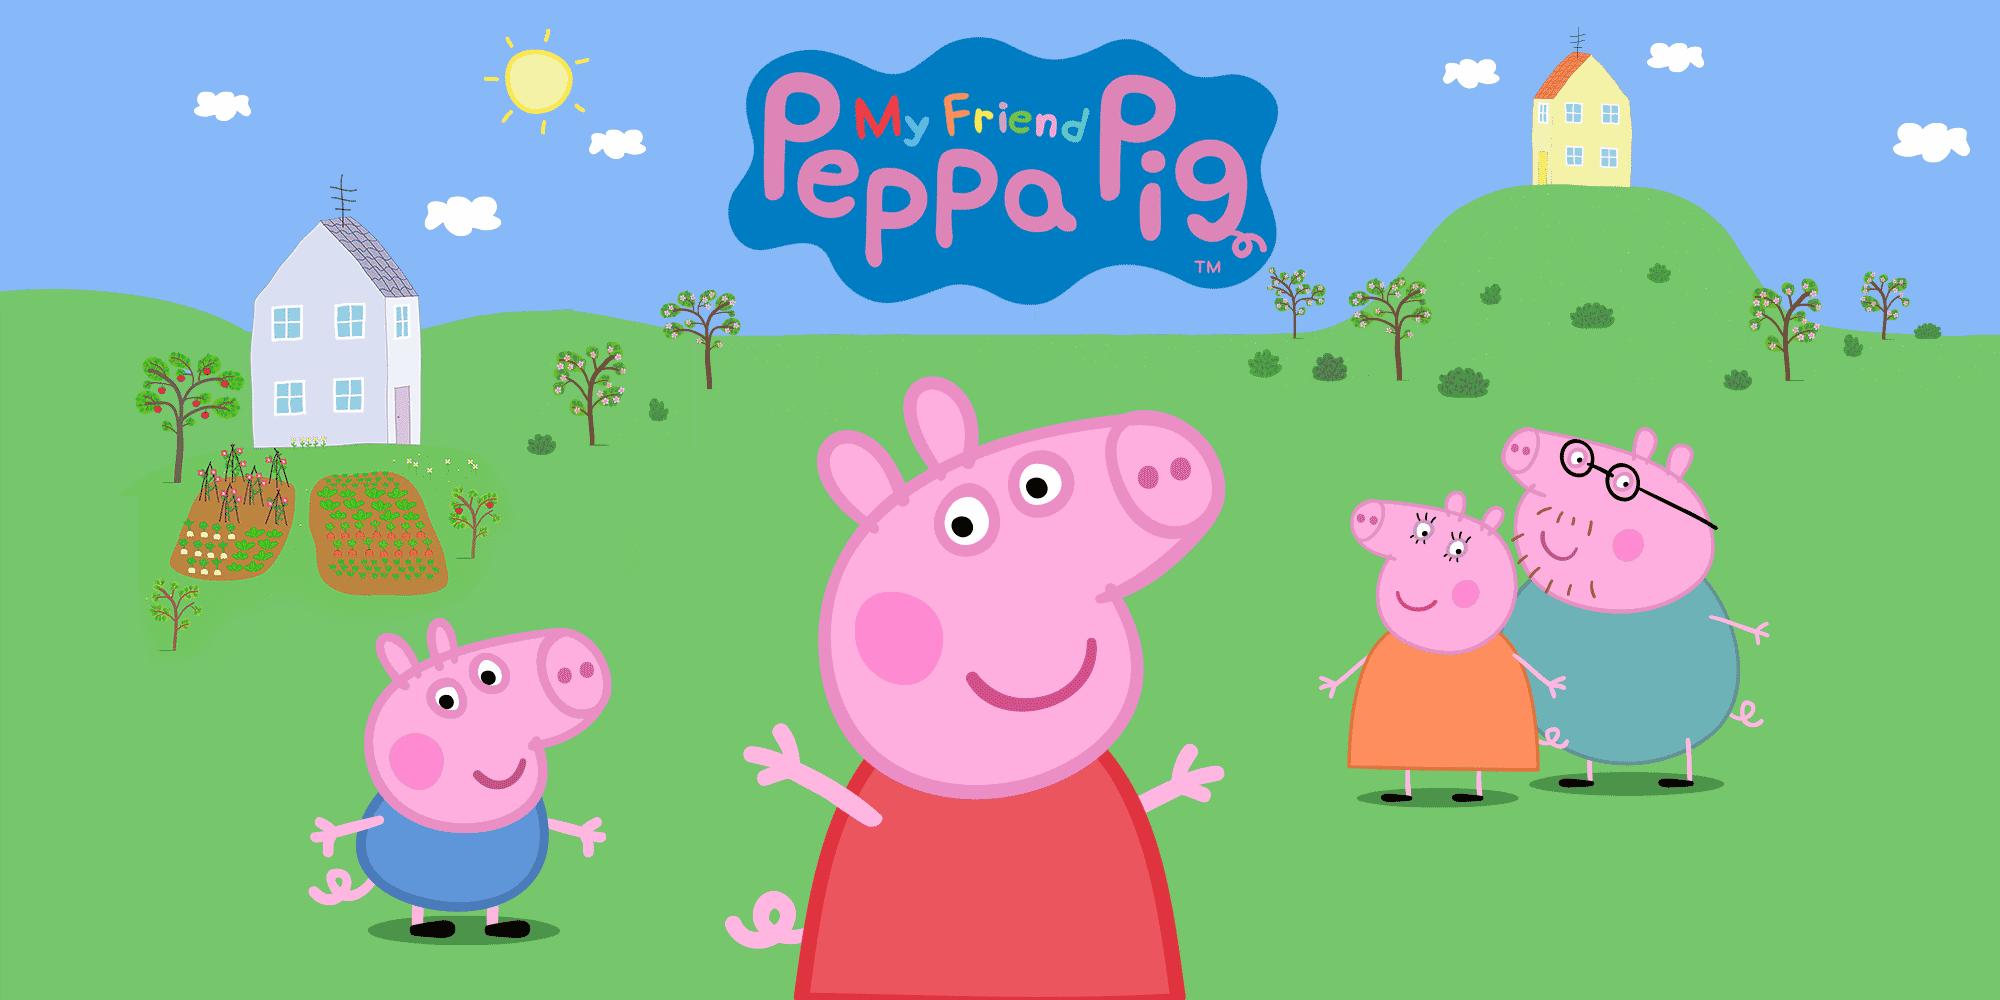 My Friend Peppa Pig Cover Art